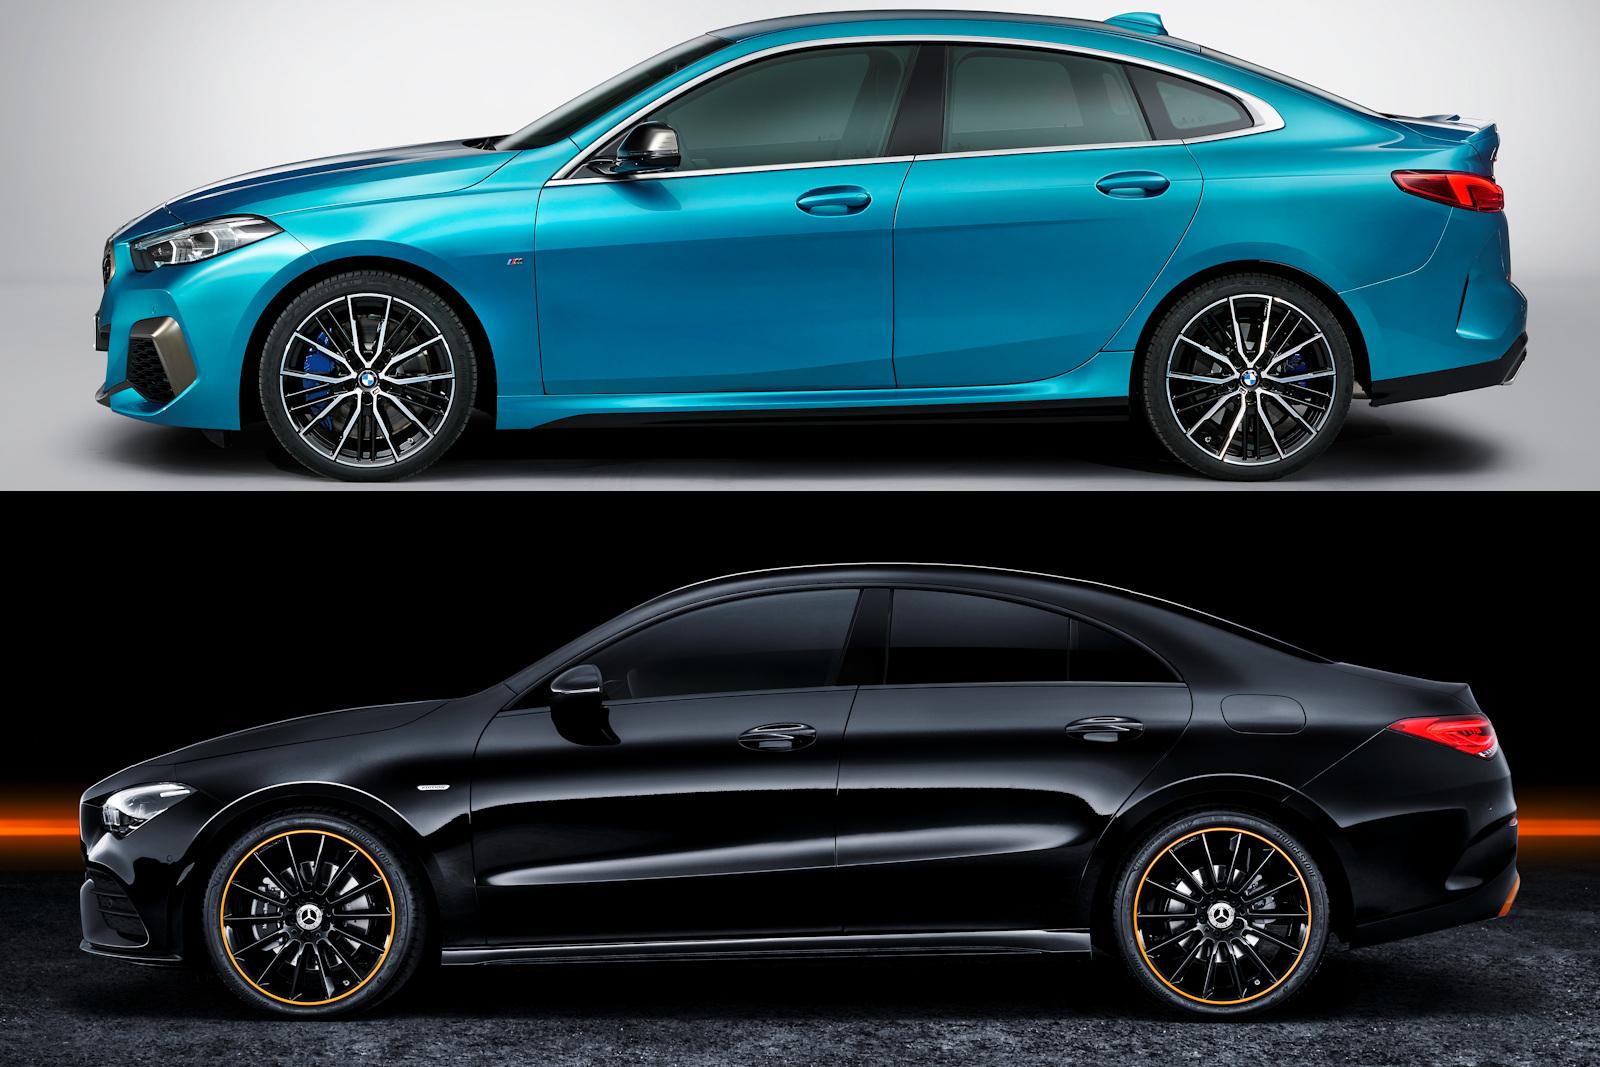 Bmw Serie 2 Gran Coupe Vs Mercedes Cla Quale Preferisci